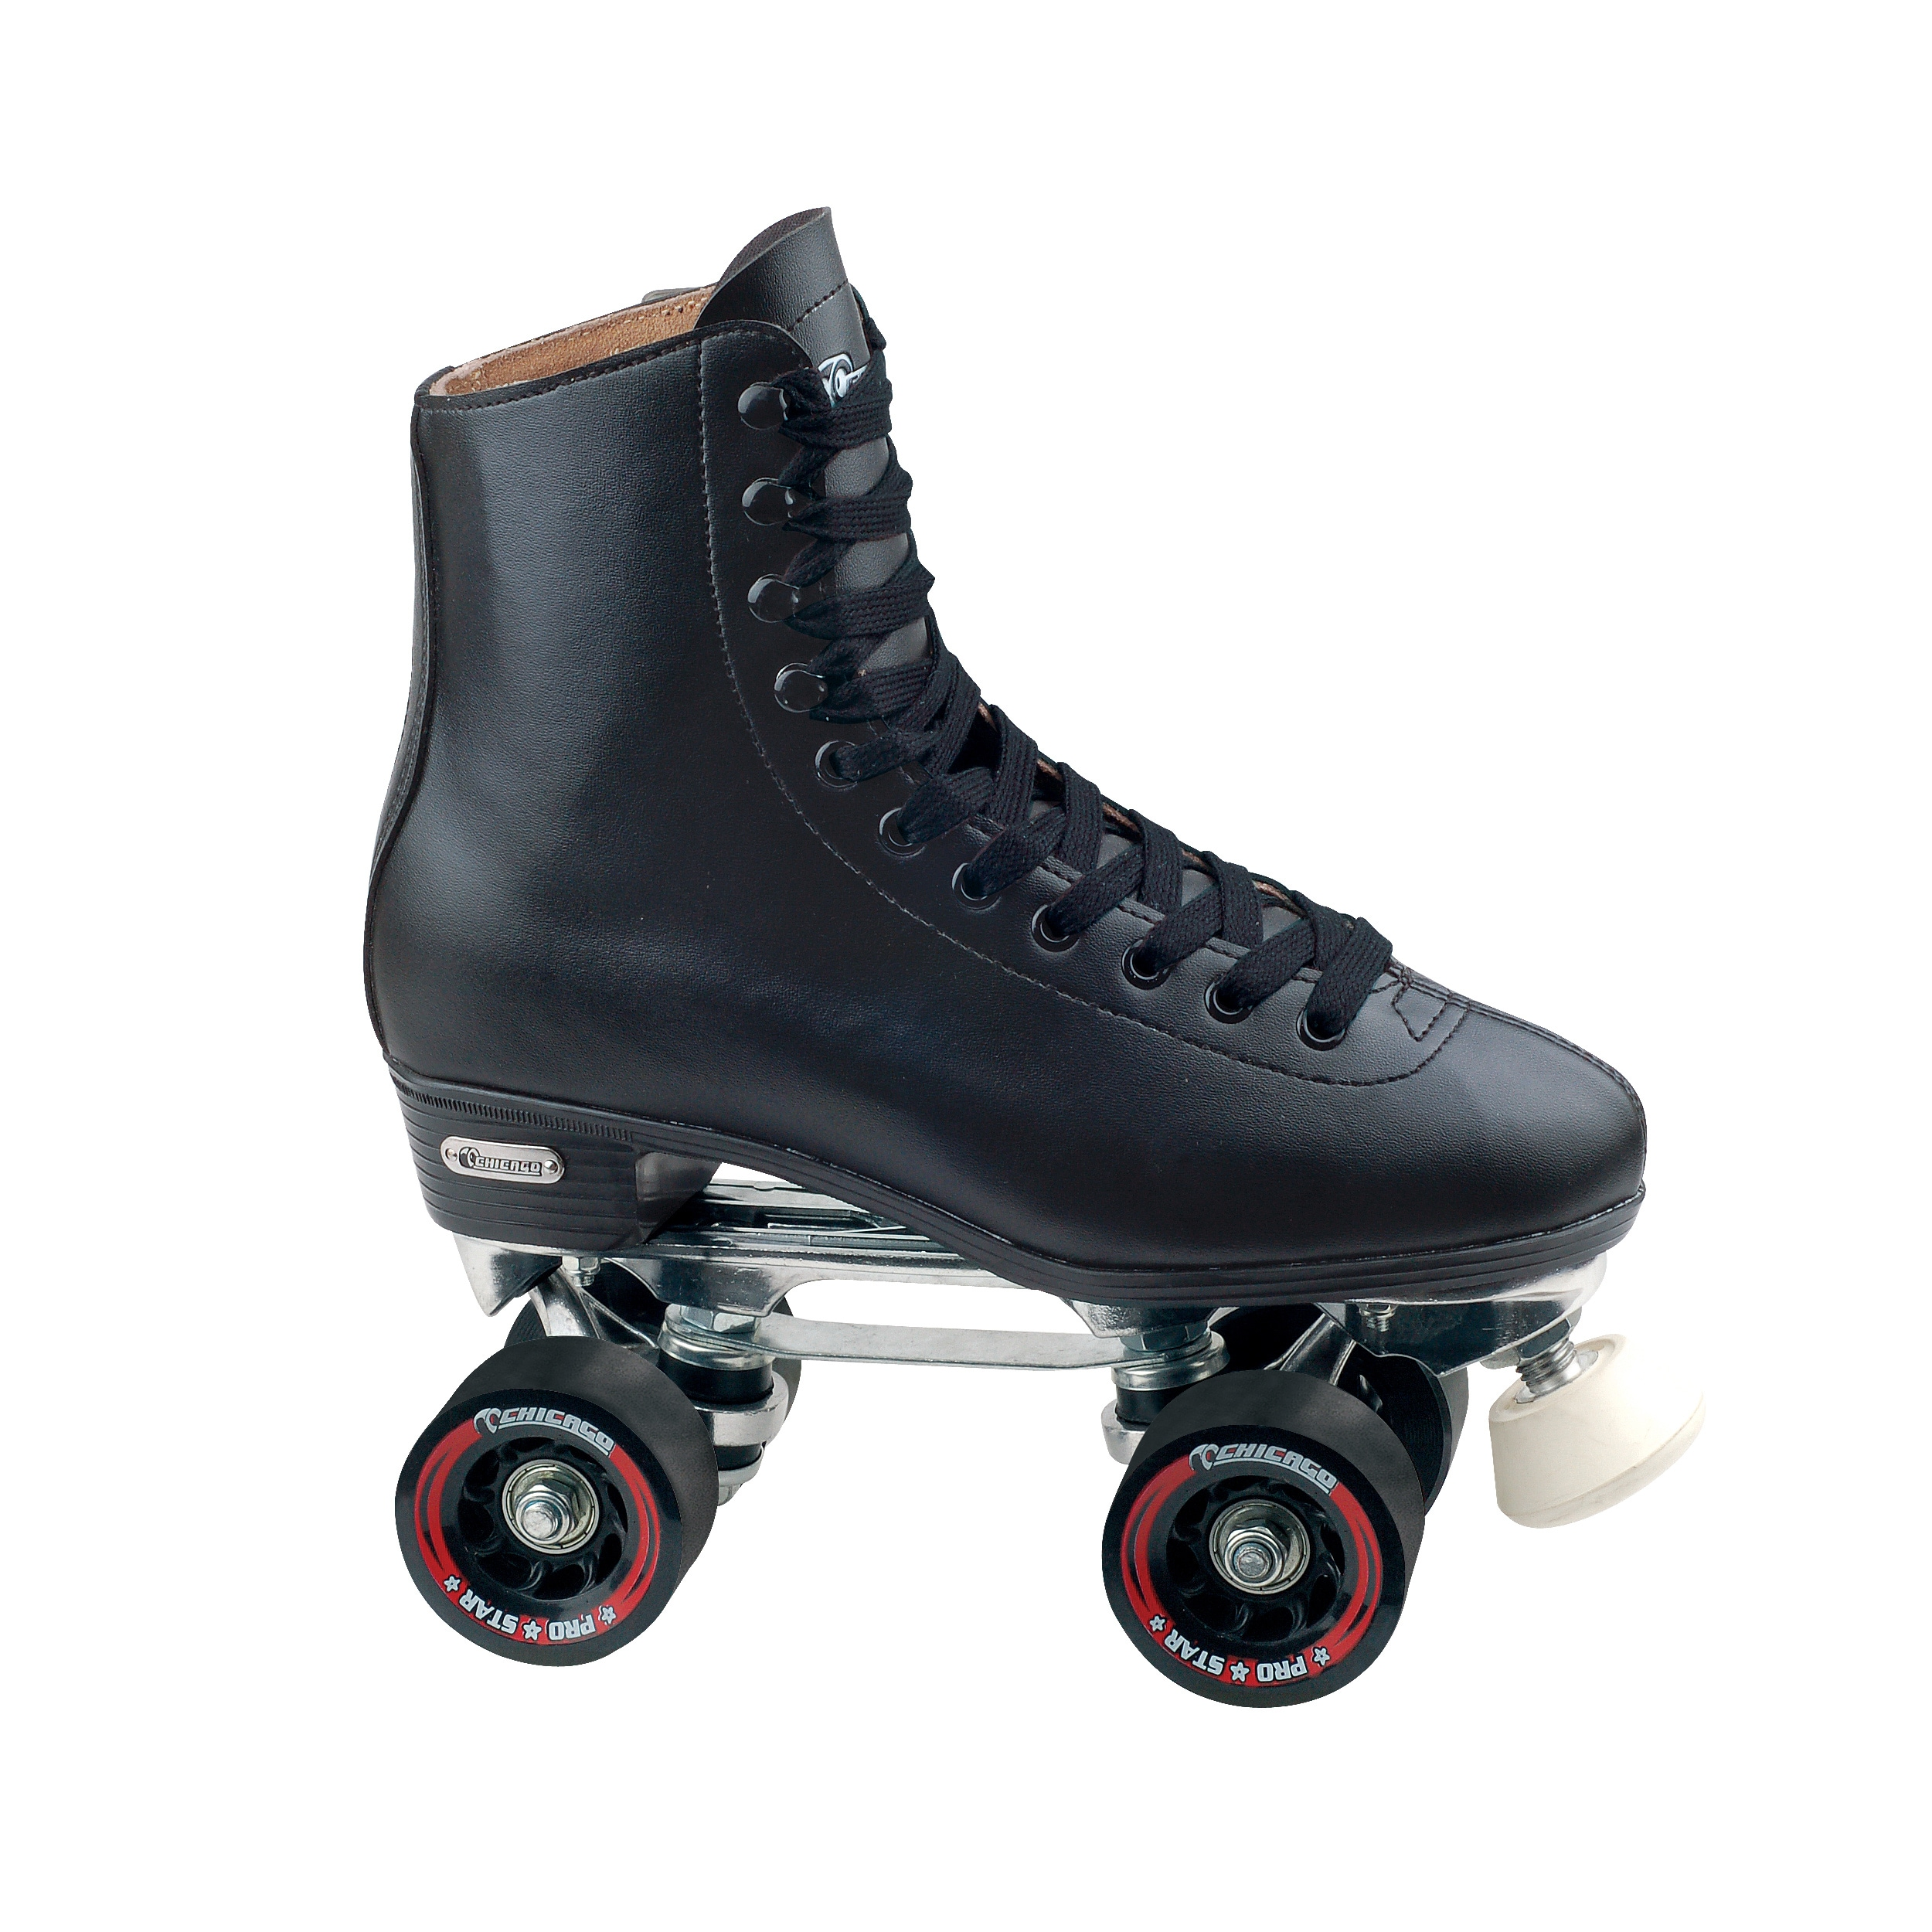 Chicago roller skates walmart - Chicago Roller Skates Walmart 9